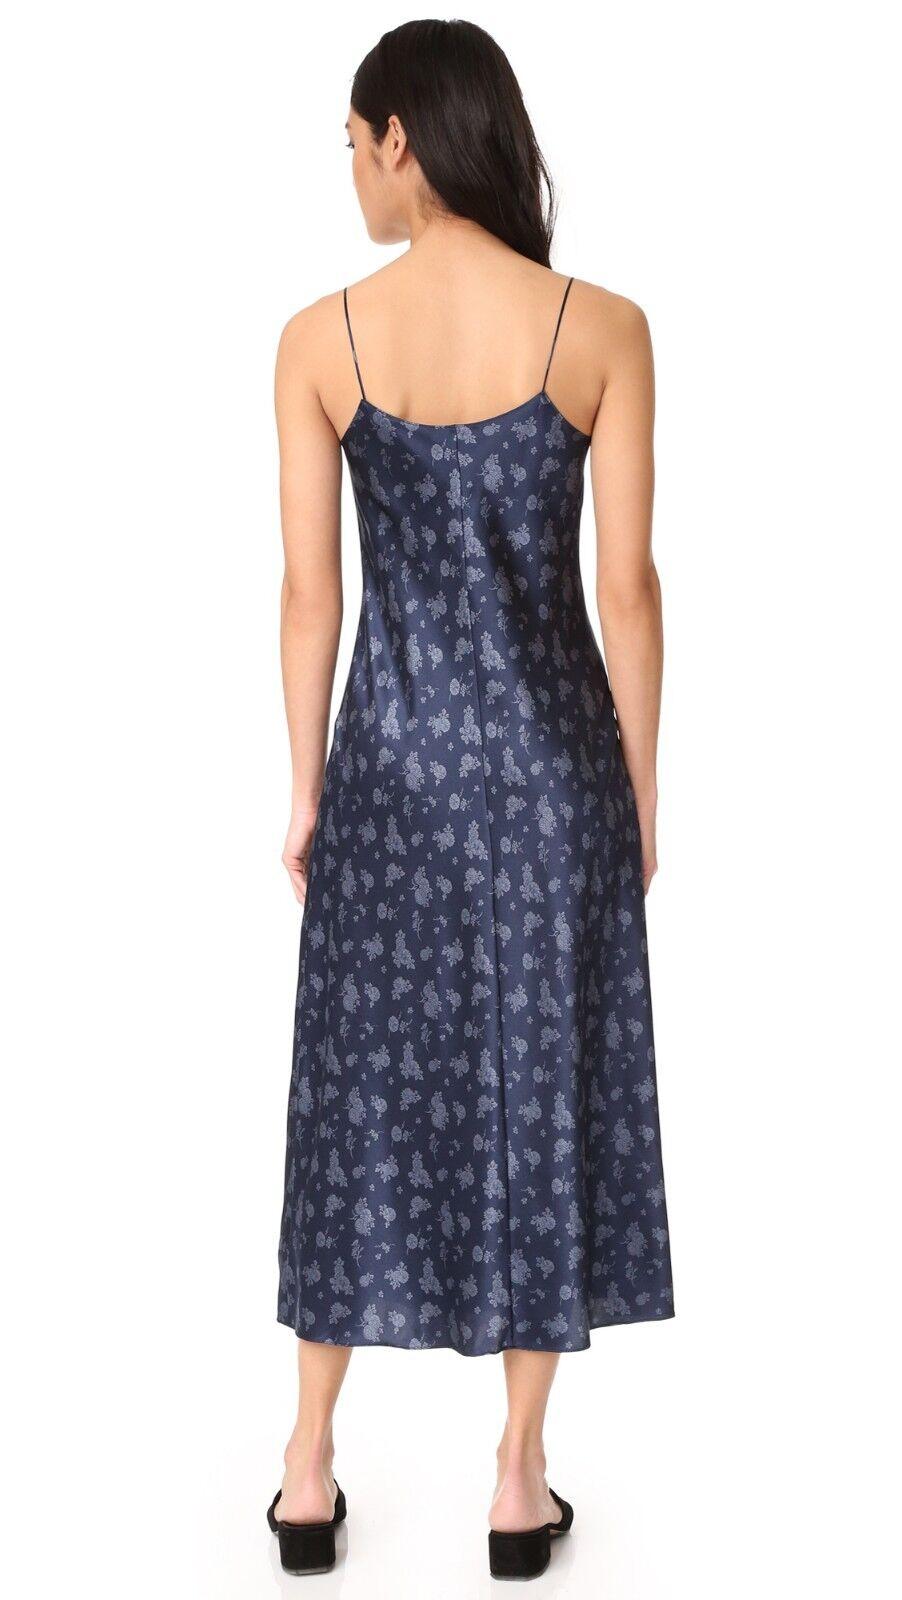 NWT Vince Vince Vince Floral Slip Dress Satin Silk Coastal bluee (Navy) Size S, M  325 699551